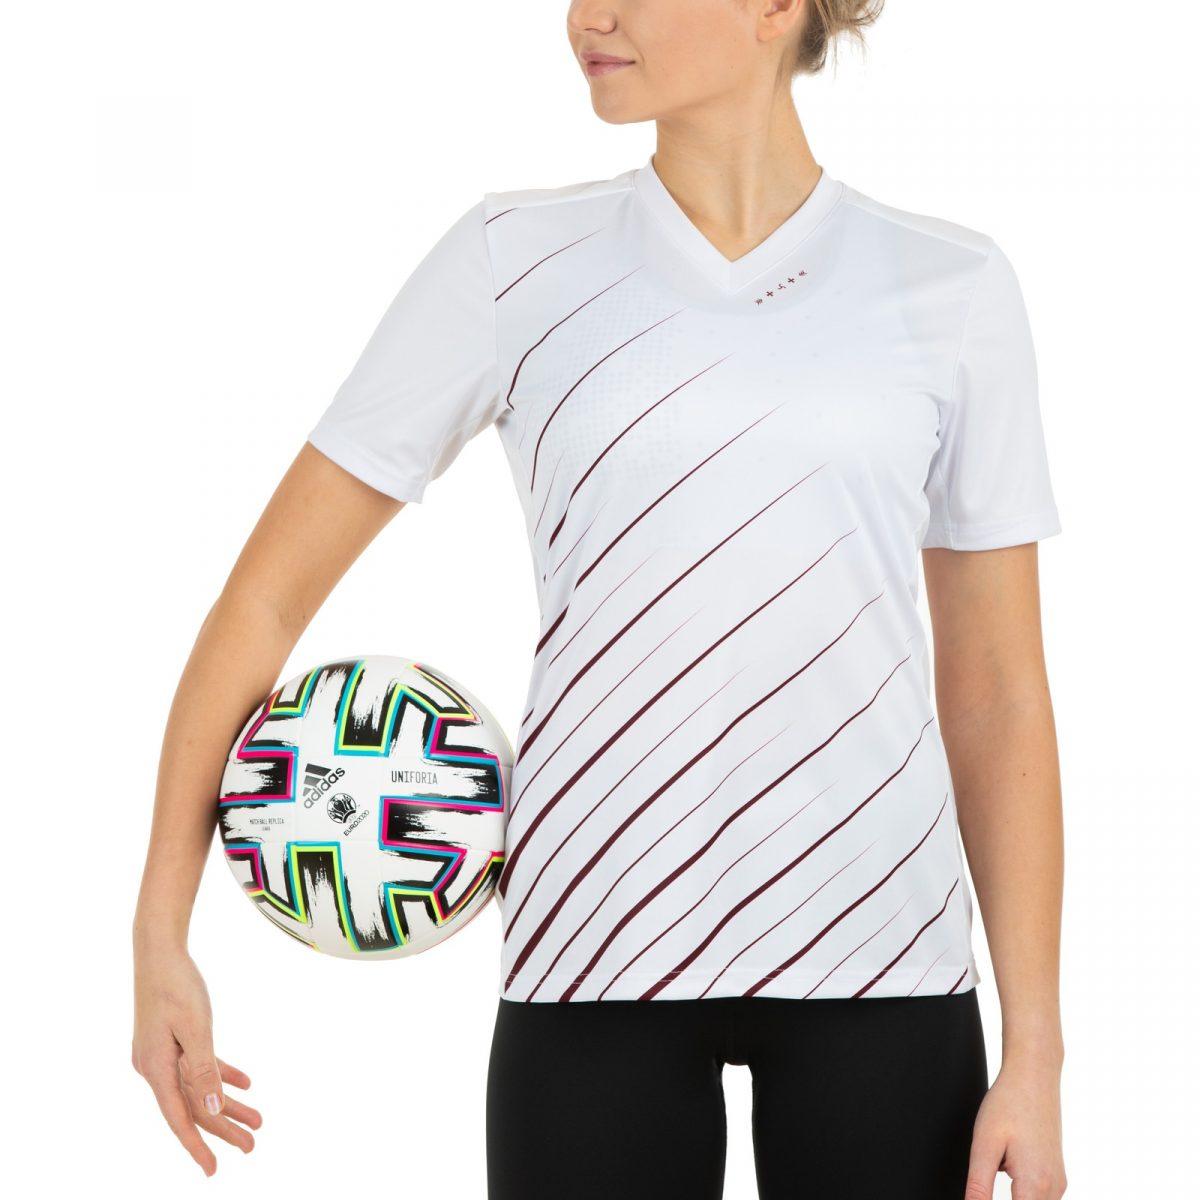 Futbola fanu krekls izbraukuma spēles